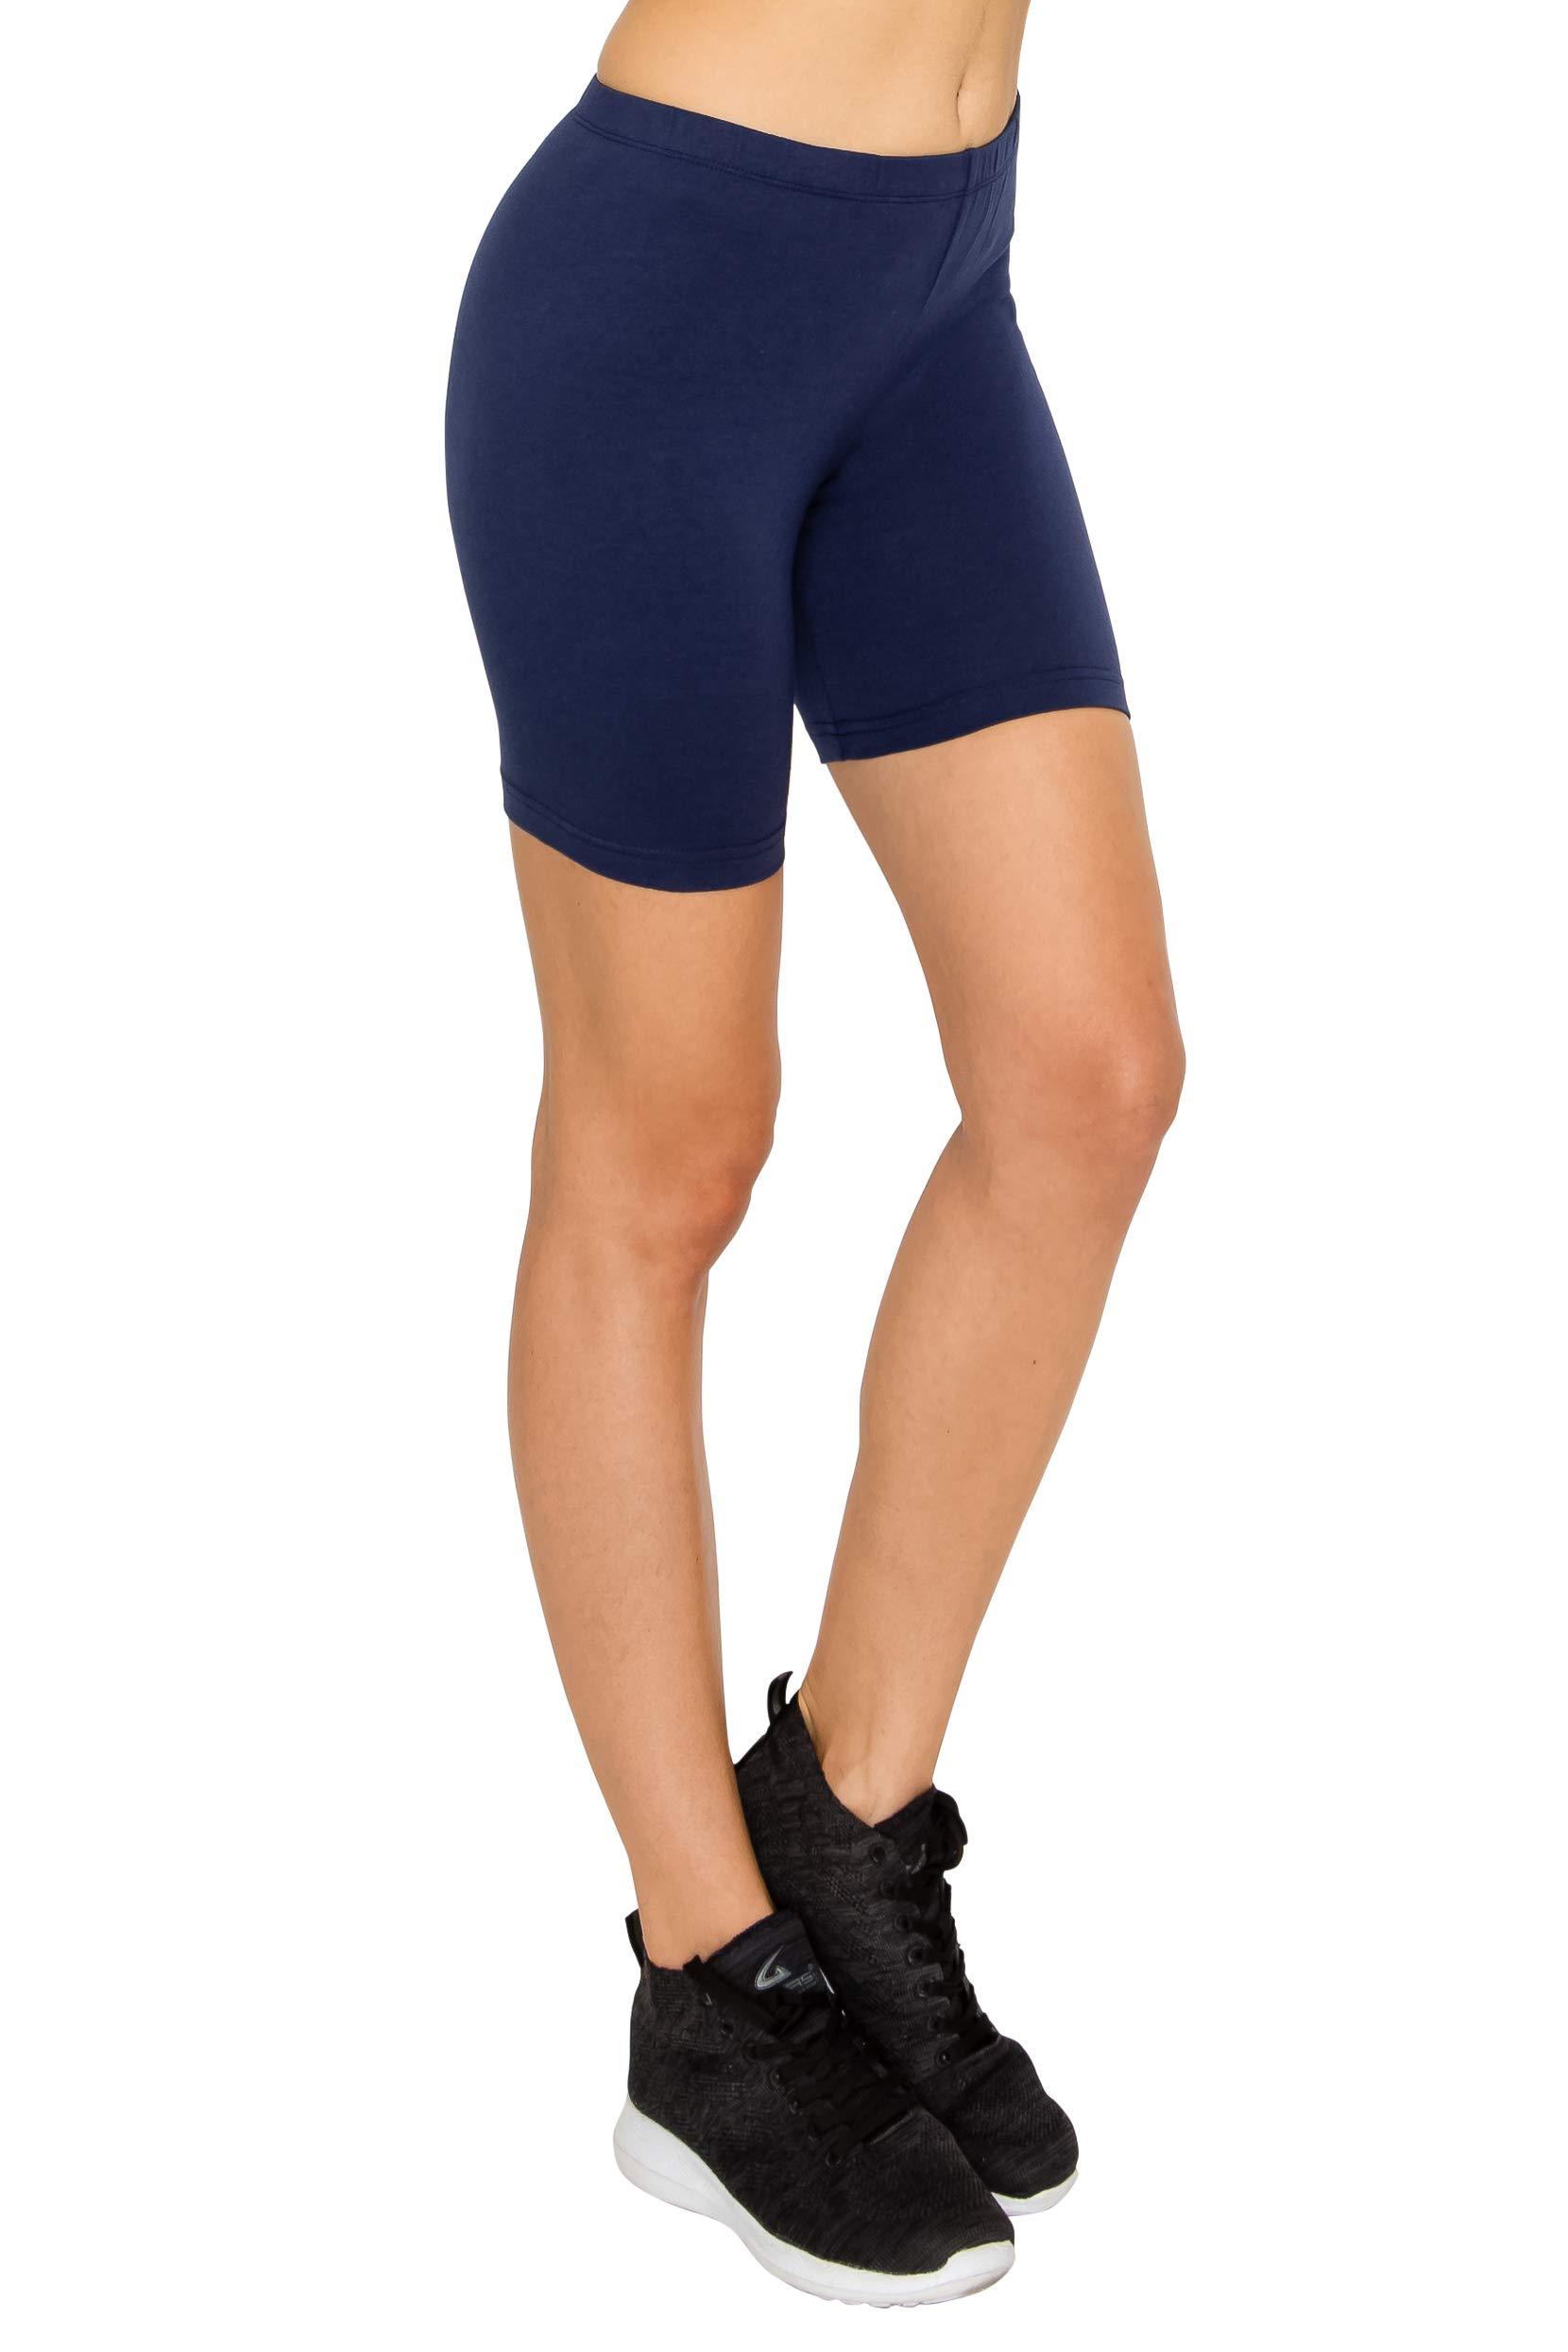 "EttelLut Cotton Active Running Bike Leggings-Athletic Exercise Yoga Walking 7""/3"" Shorts"